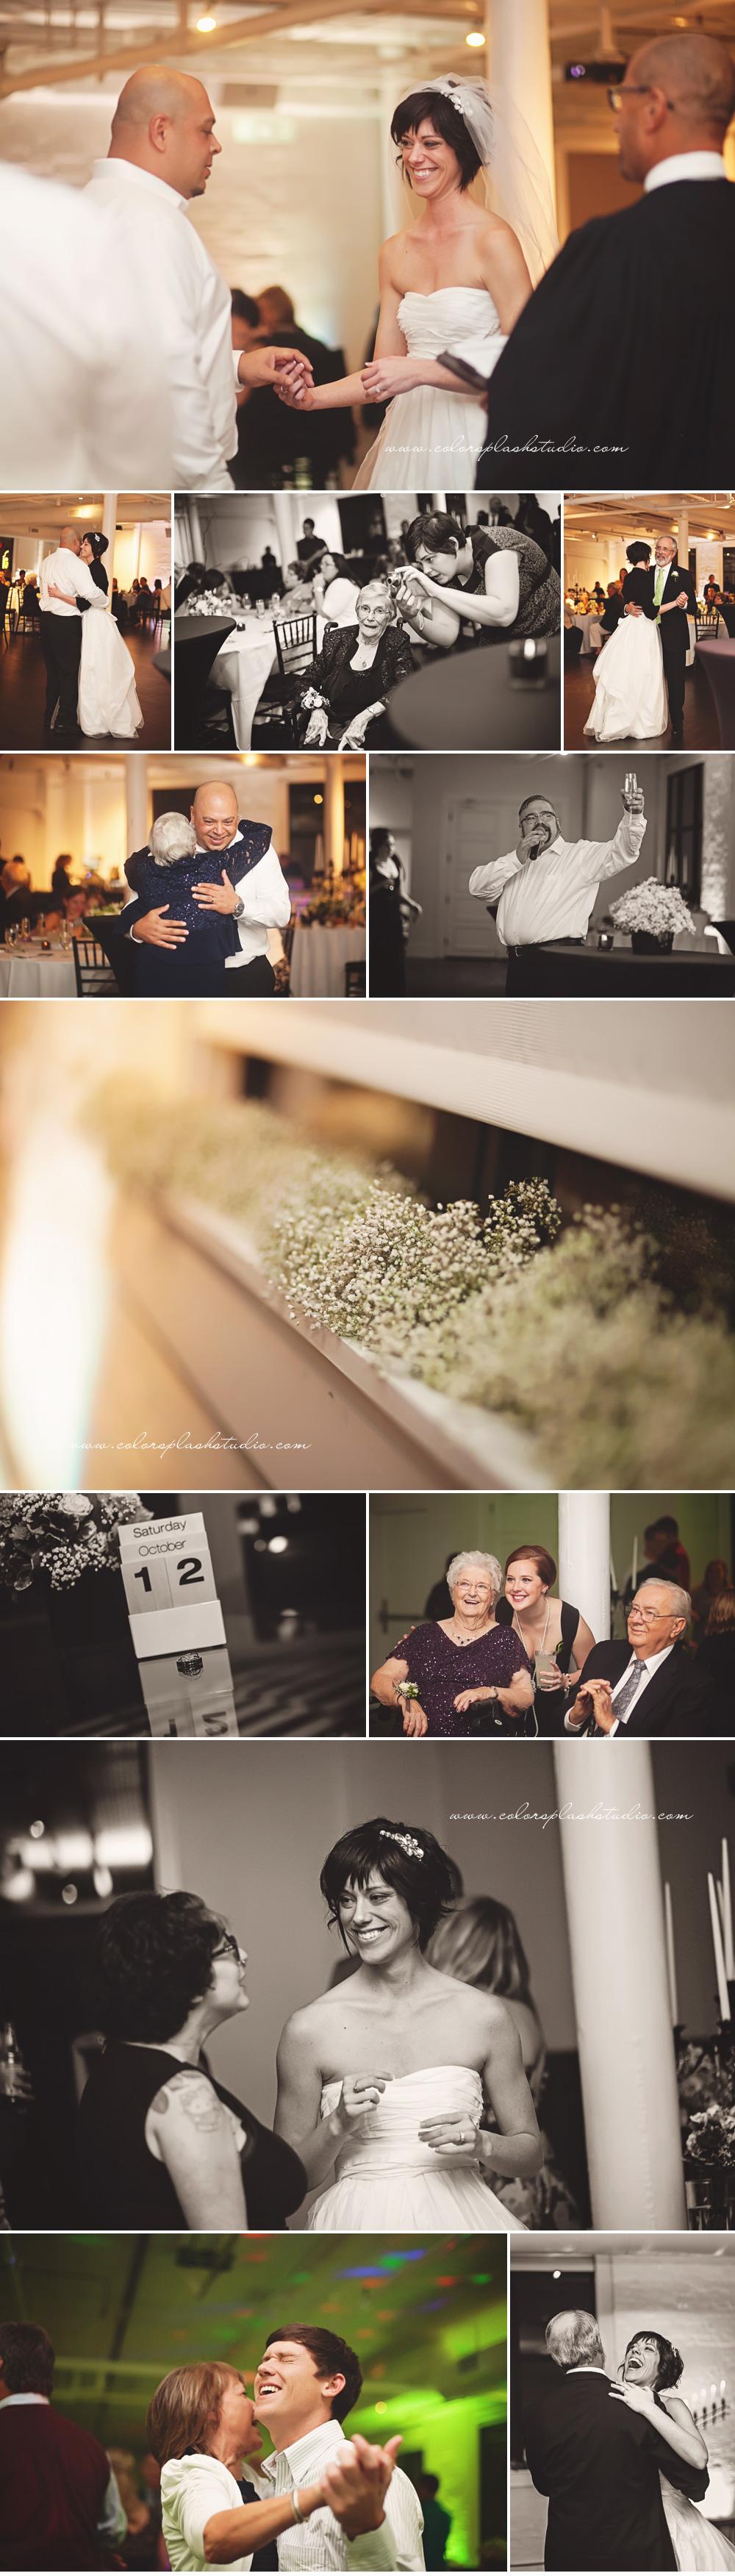 Wedding at the Gatsby in Kalamazoo